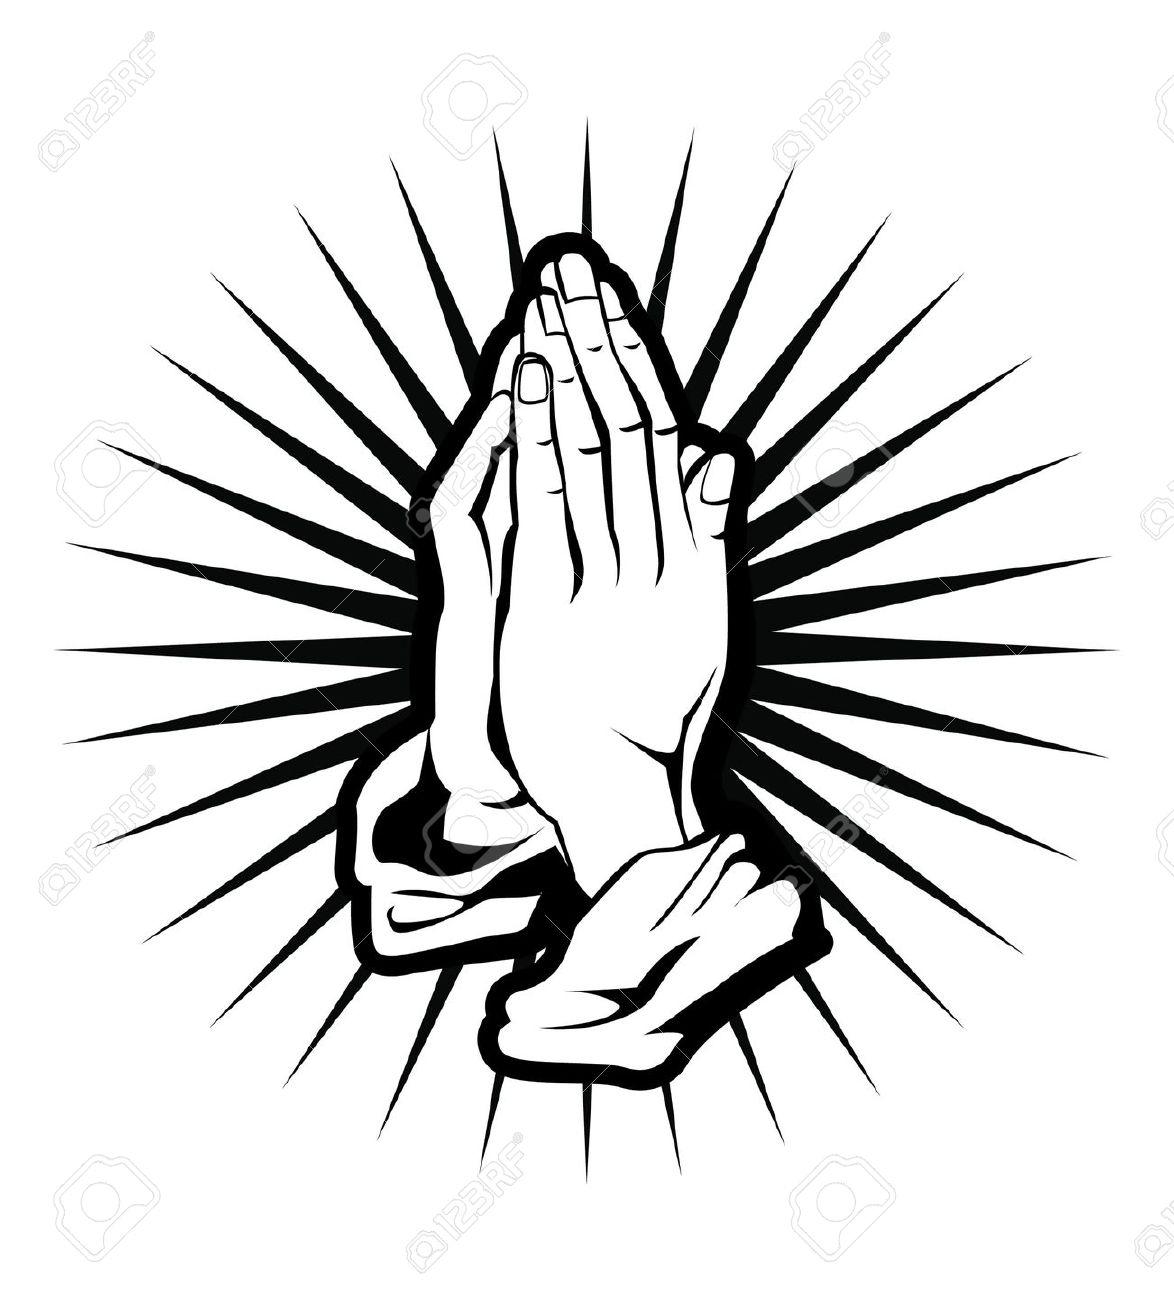 Prayer Hands Images